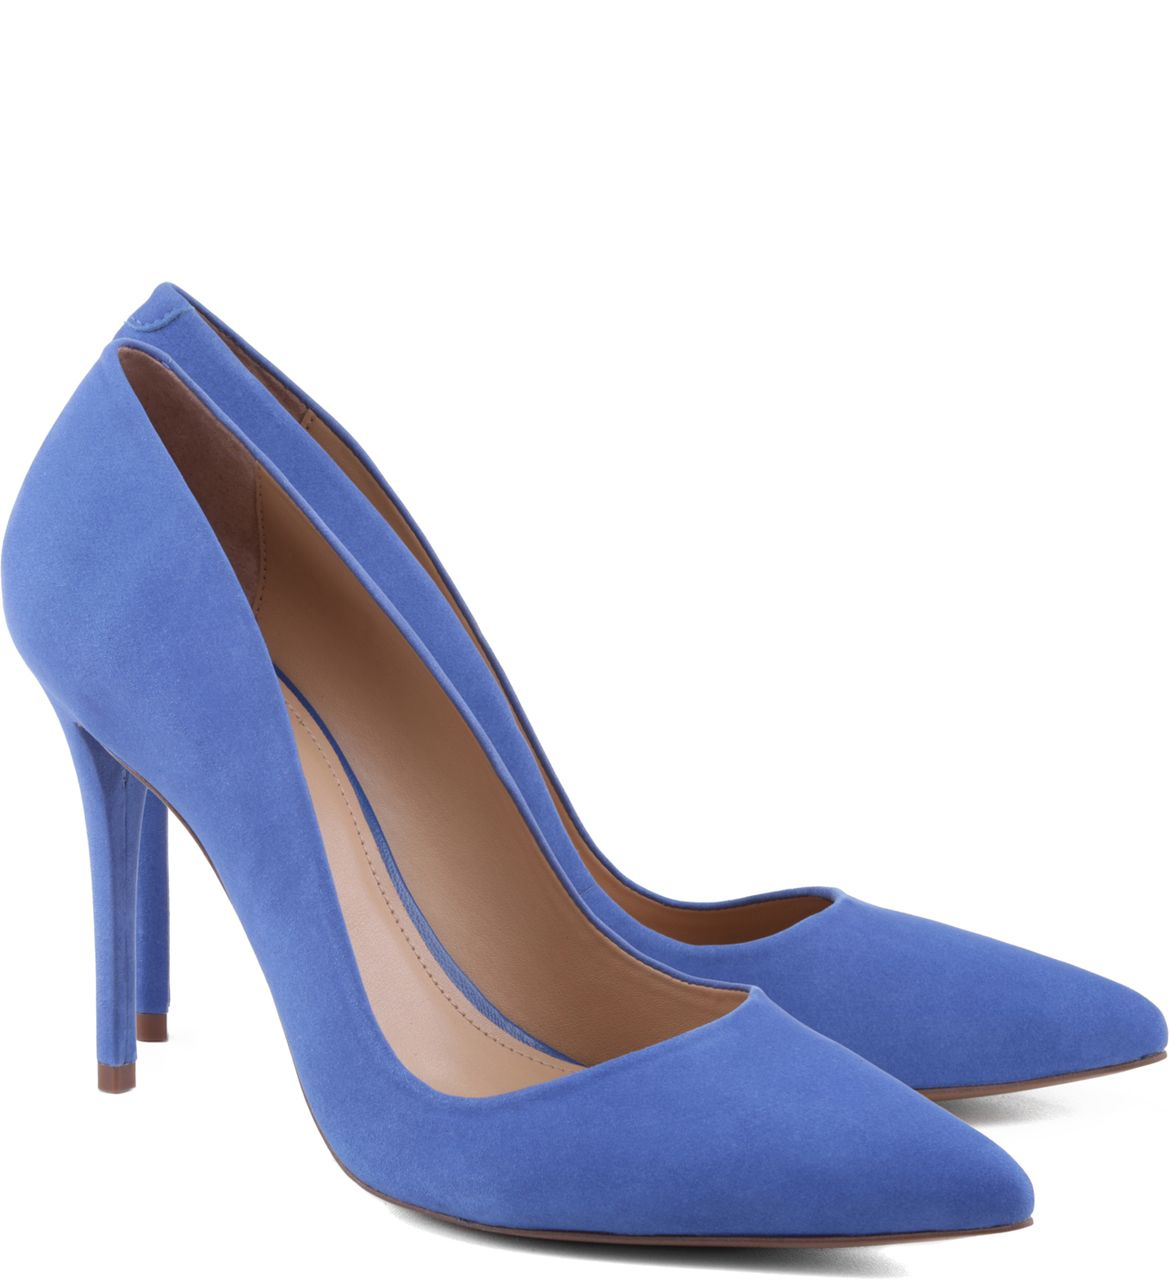 3aee977c15 Scarpin Nobuck Azul